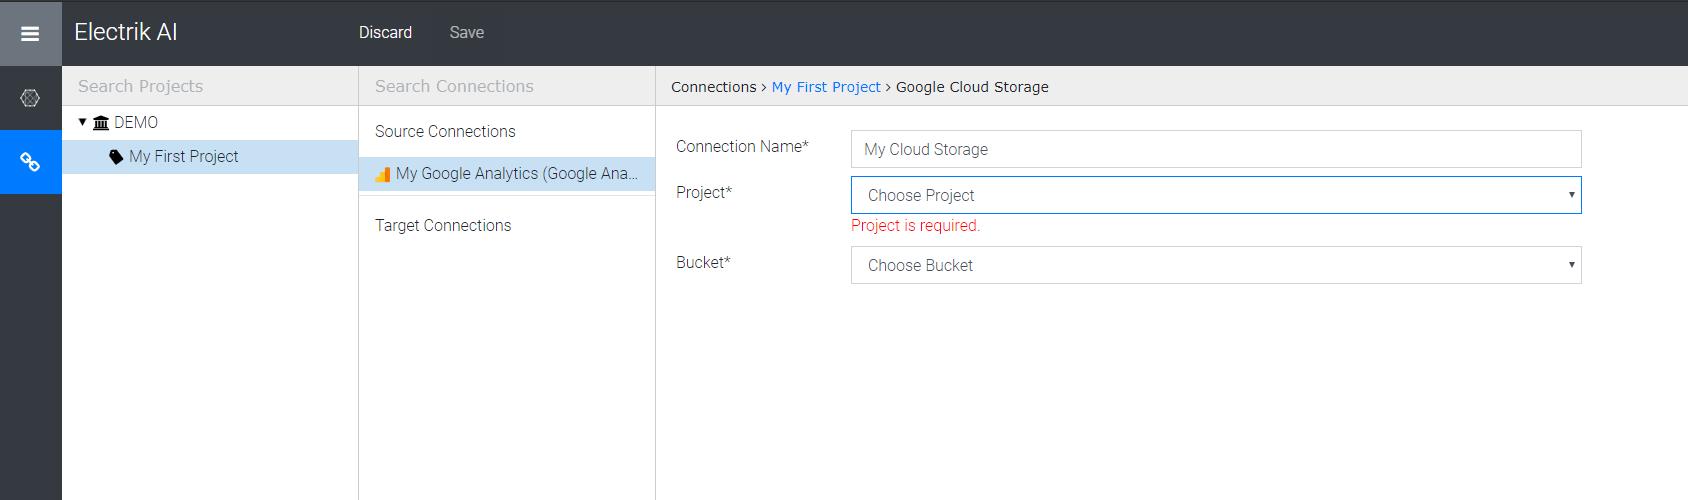 Google cloud storage project and bucket-Electrik.ai